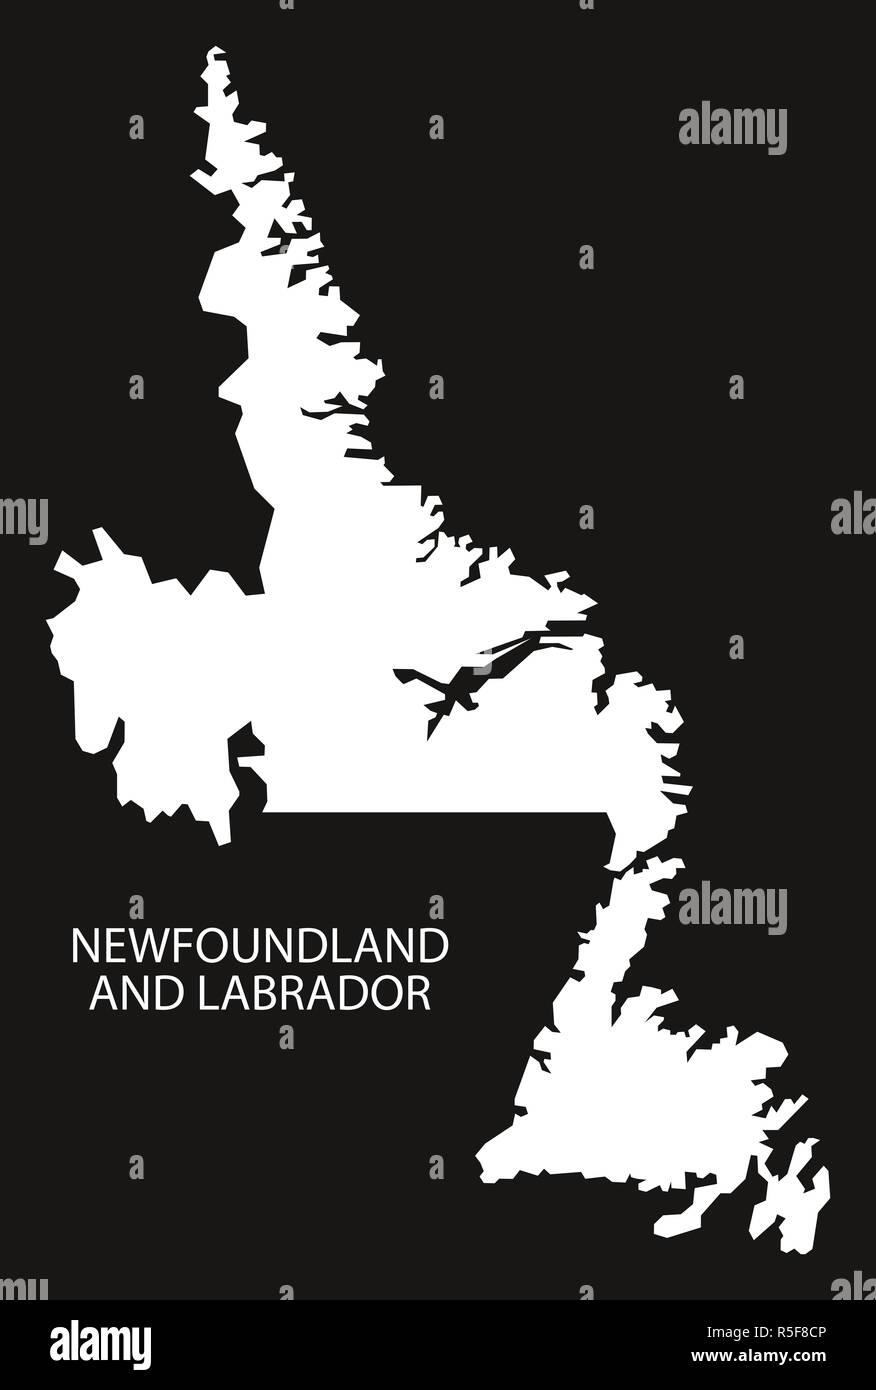 Newfoundland and Labrador Canada map black inverted silhouette illustration shape Stock Photo